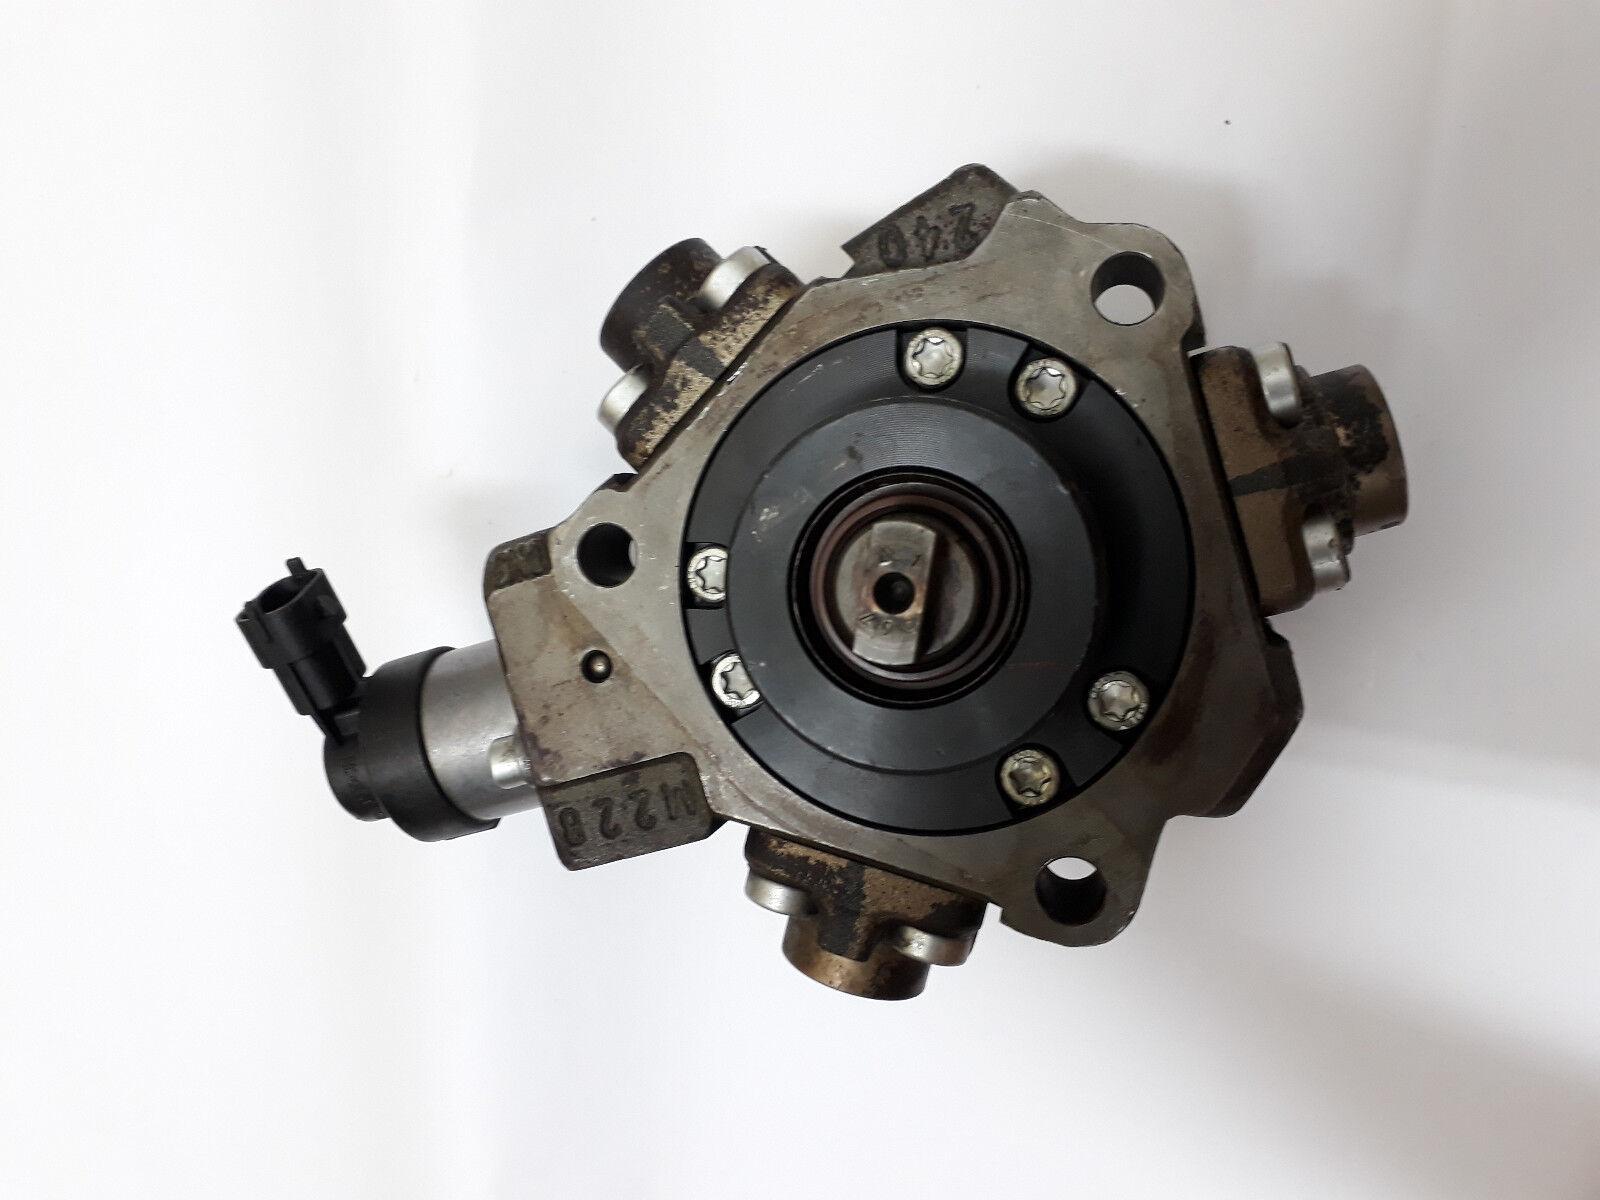 Used Hummer H3 Fuel Pumps for Sale